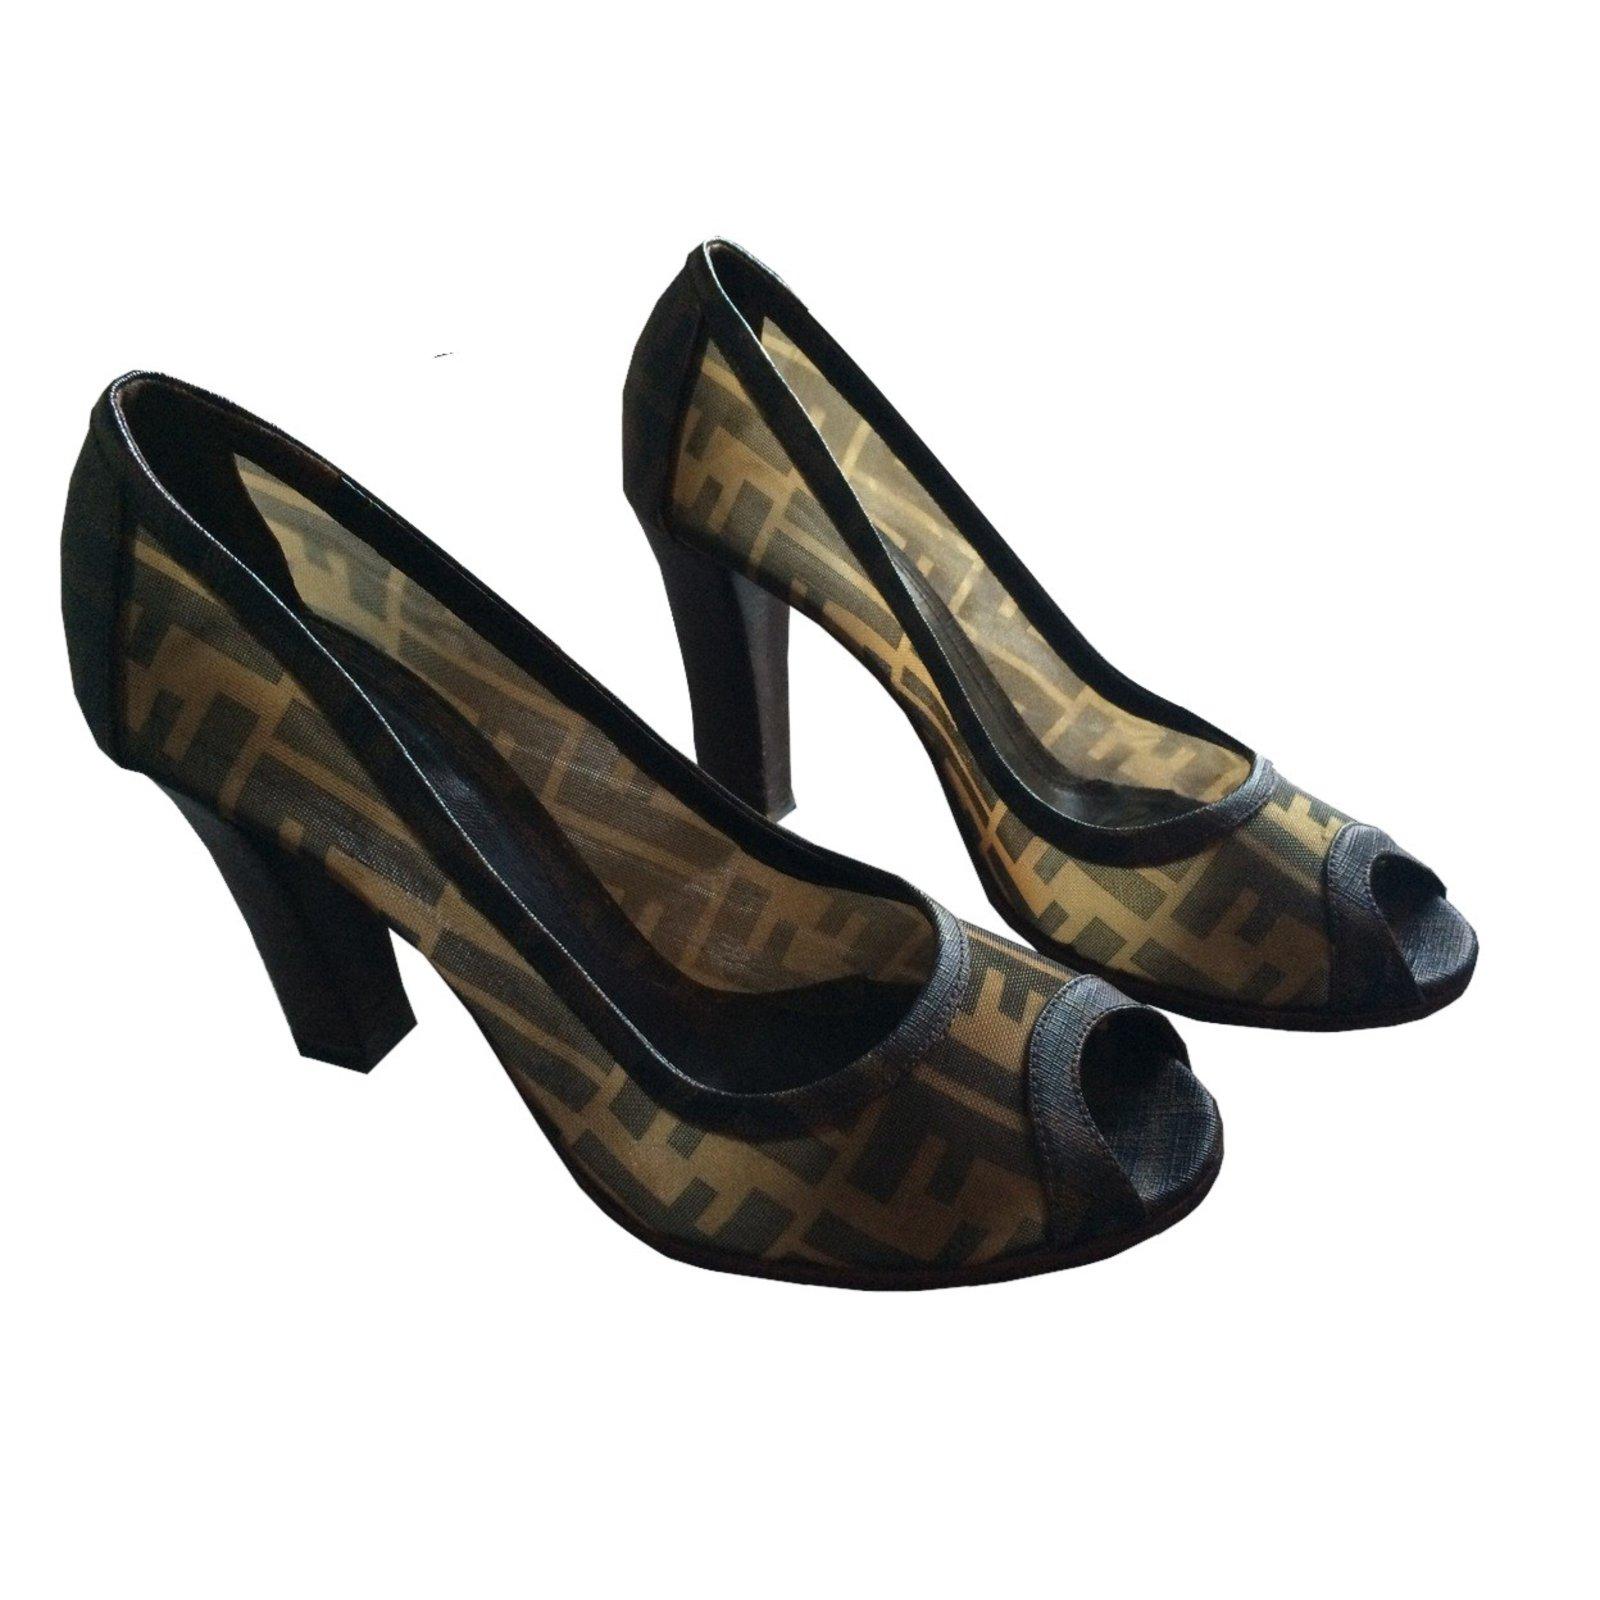 97a7f892fbbca Fendi Chaussure